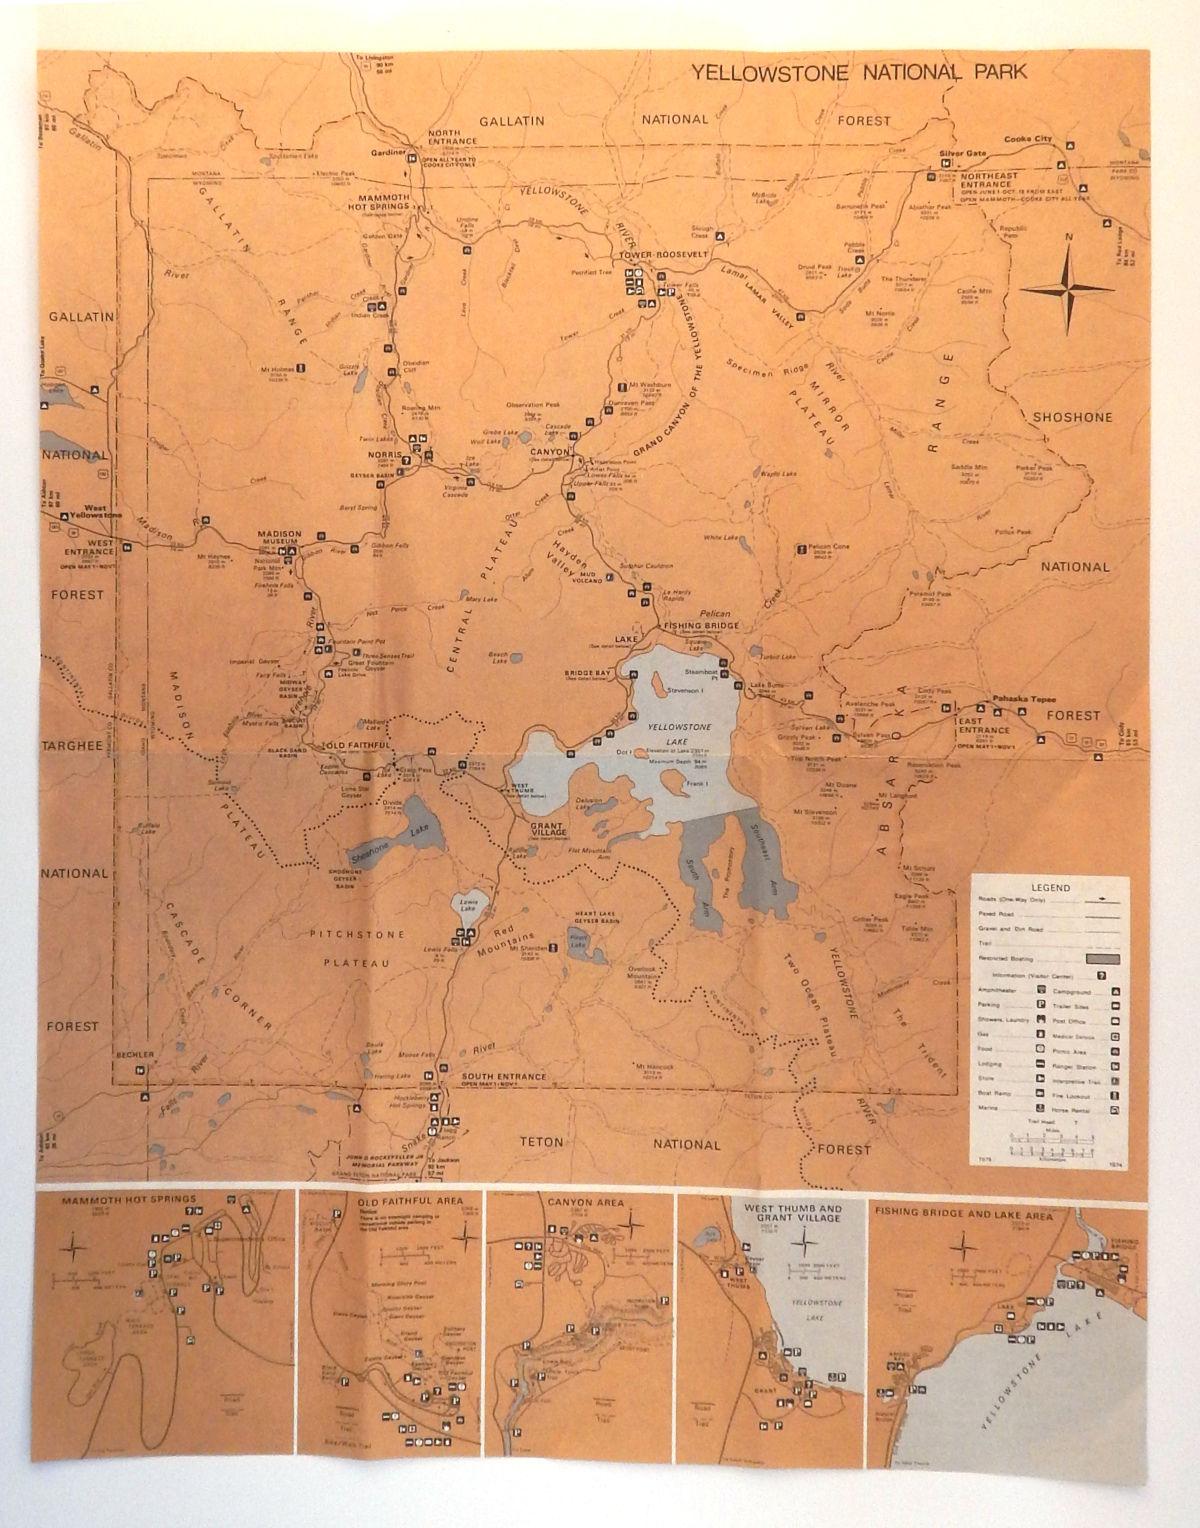 Image for Map of Yellowstone National Park / Grand Teton National Park and John D. Rockefeller Jr. Memorial Parkway